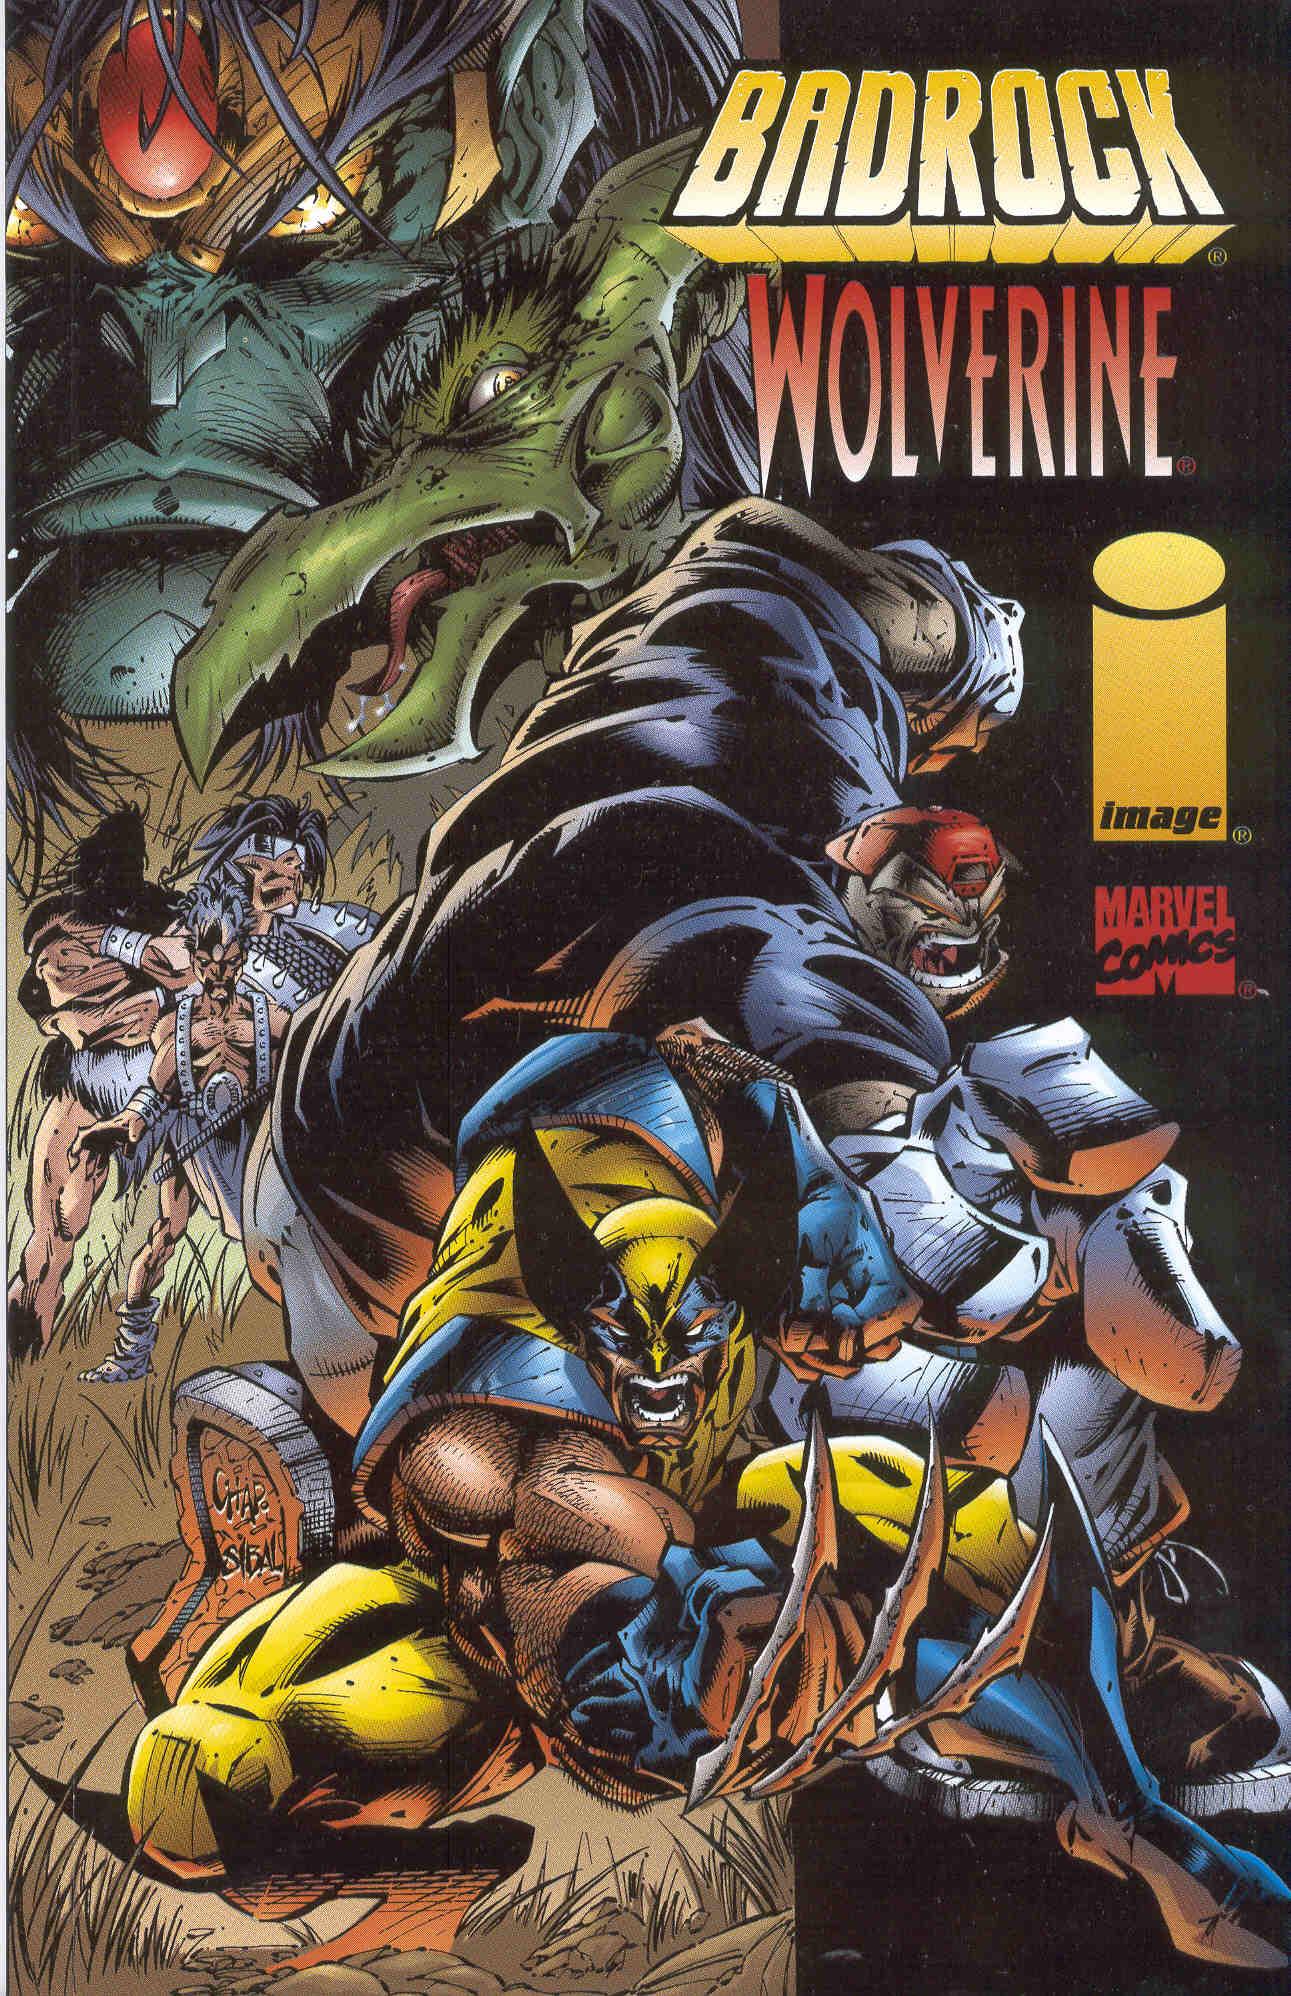 Badrock/Wolverine Full Page 1